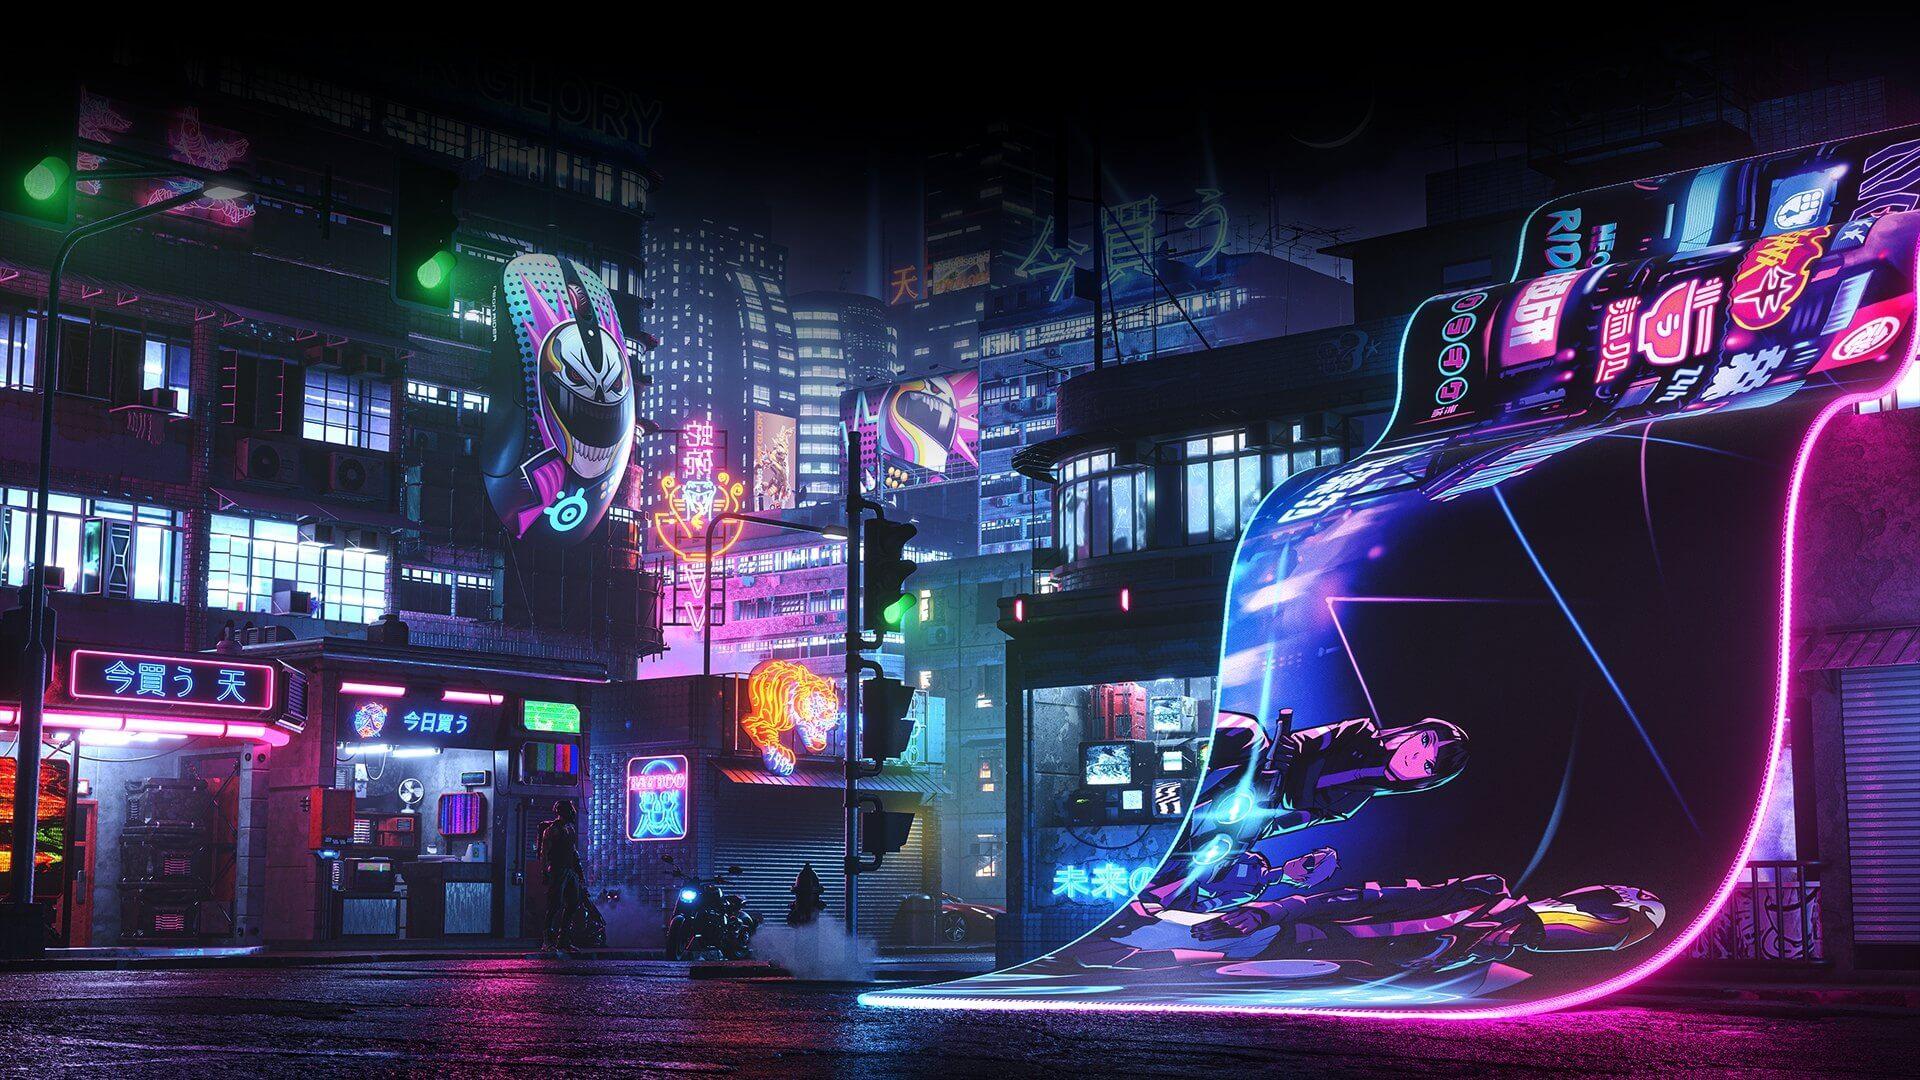 Giới thiệu Bàn di chuột Steelseries Qck Prism(XL) Neon Rider - 63809